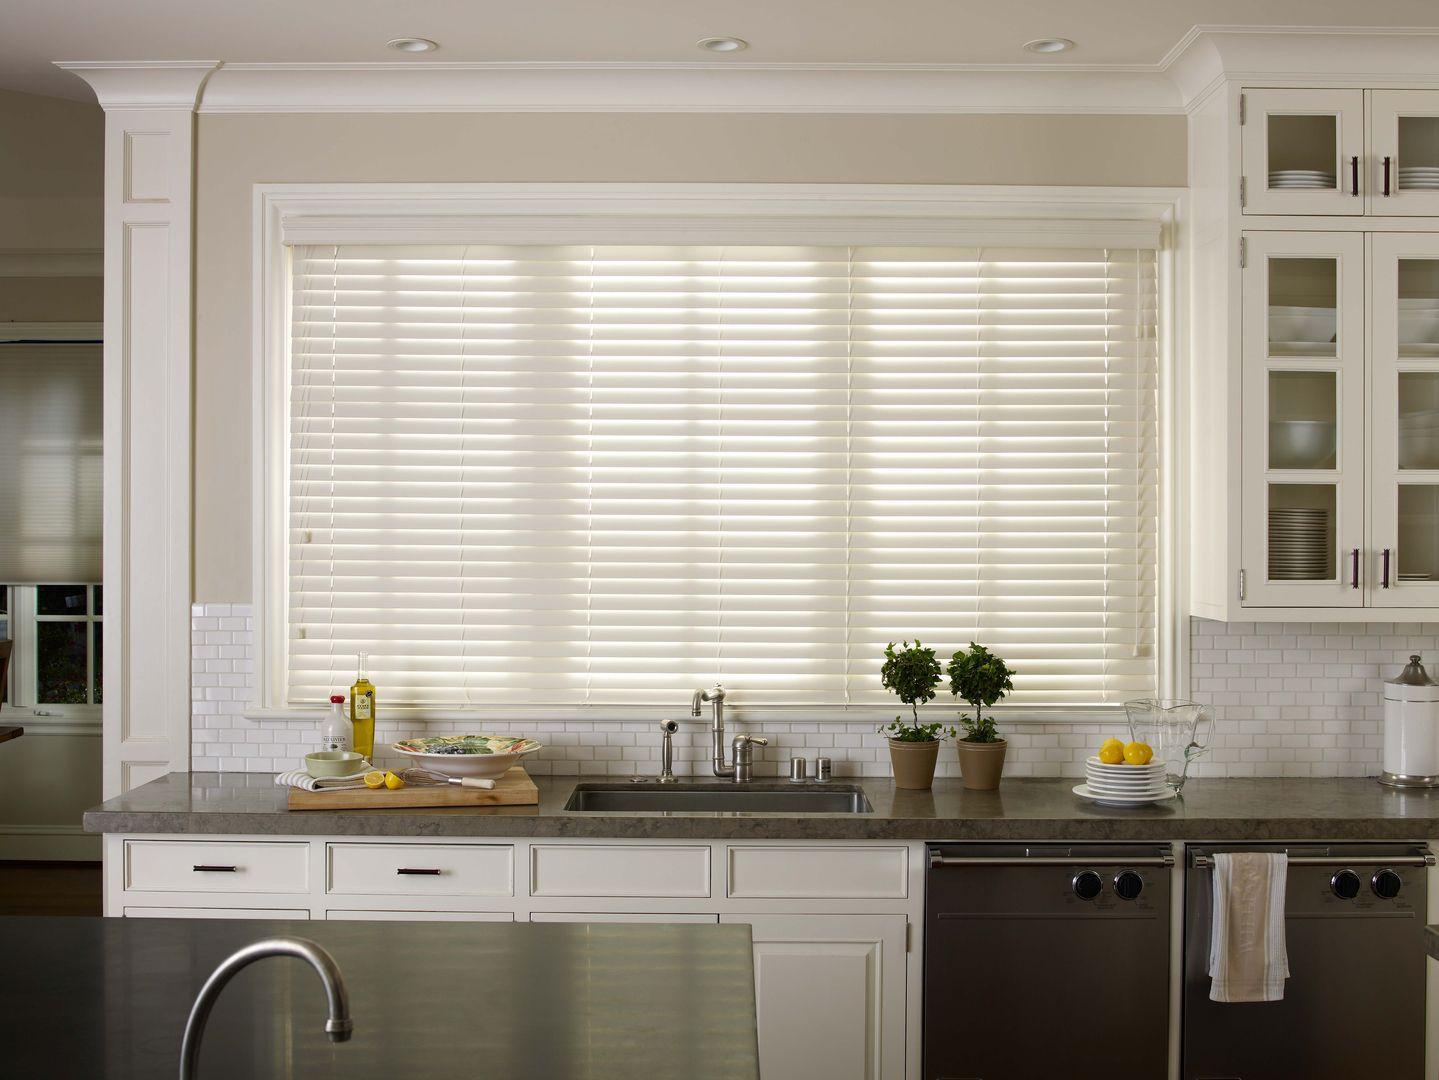 con myhomedesign alta tonalidas blinds shades shapeyourminds green corado com vertical en for reviews vers win honeycomb